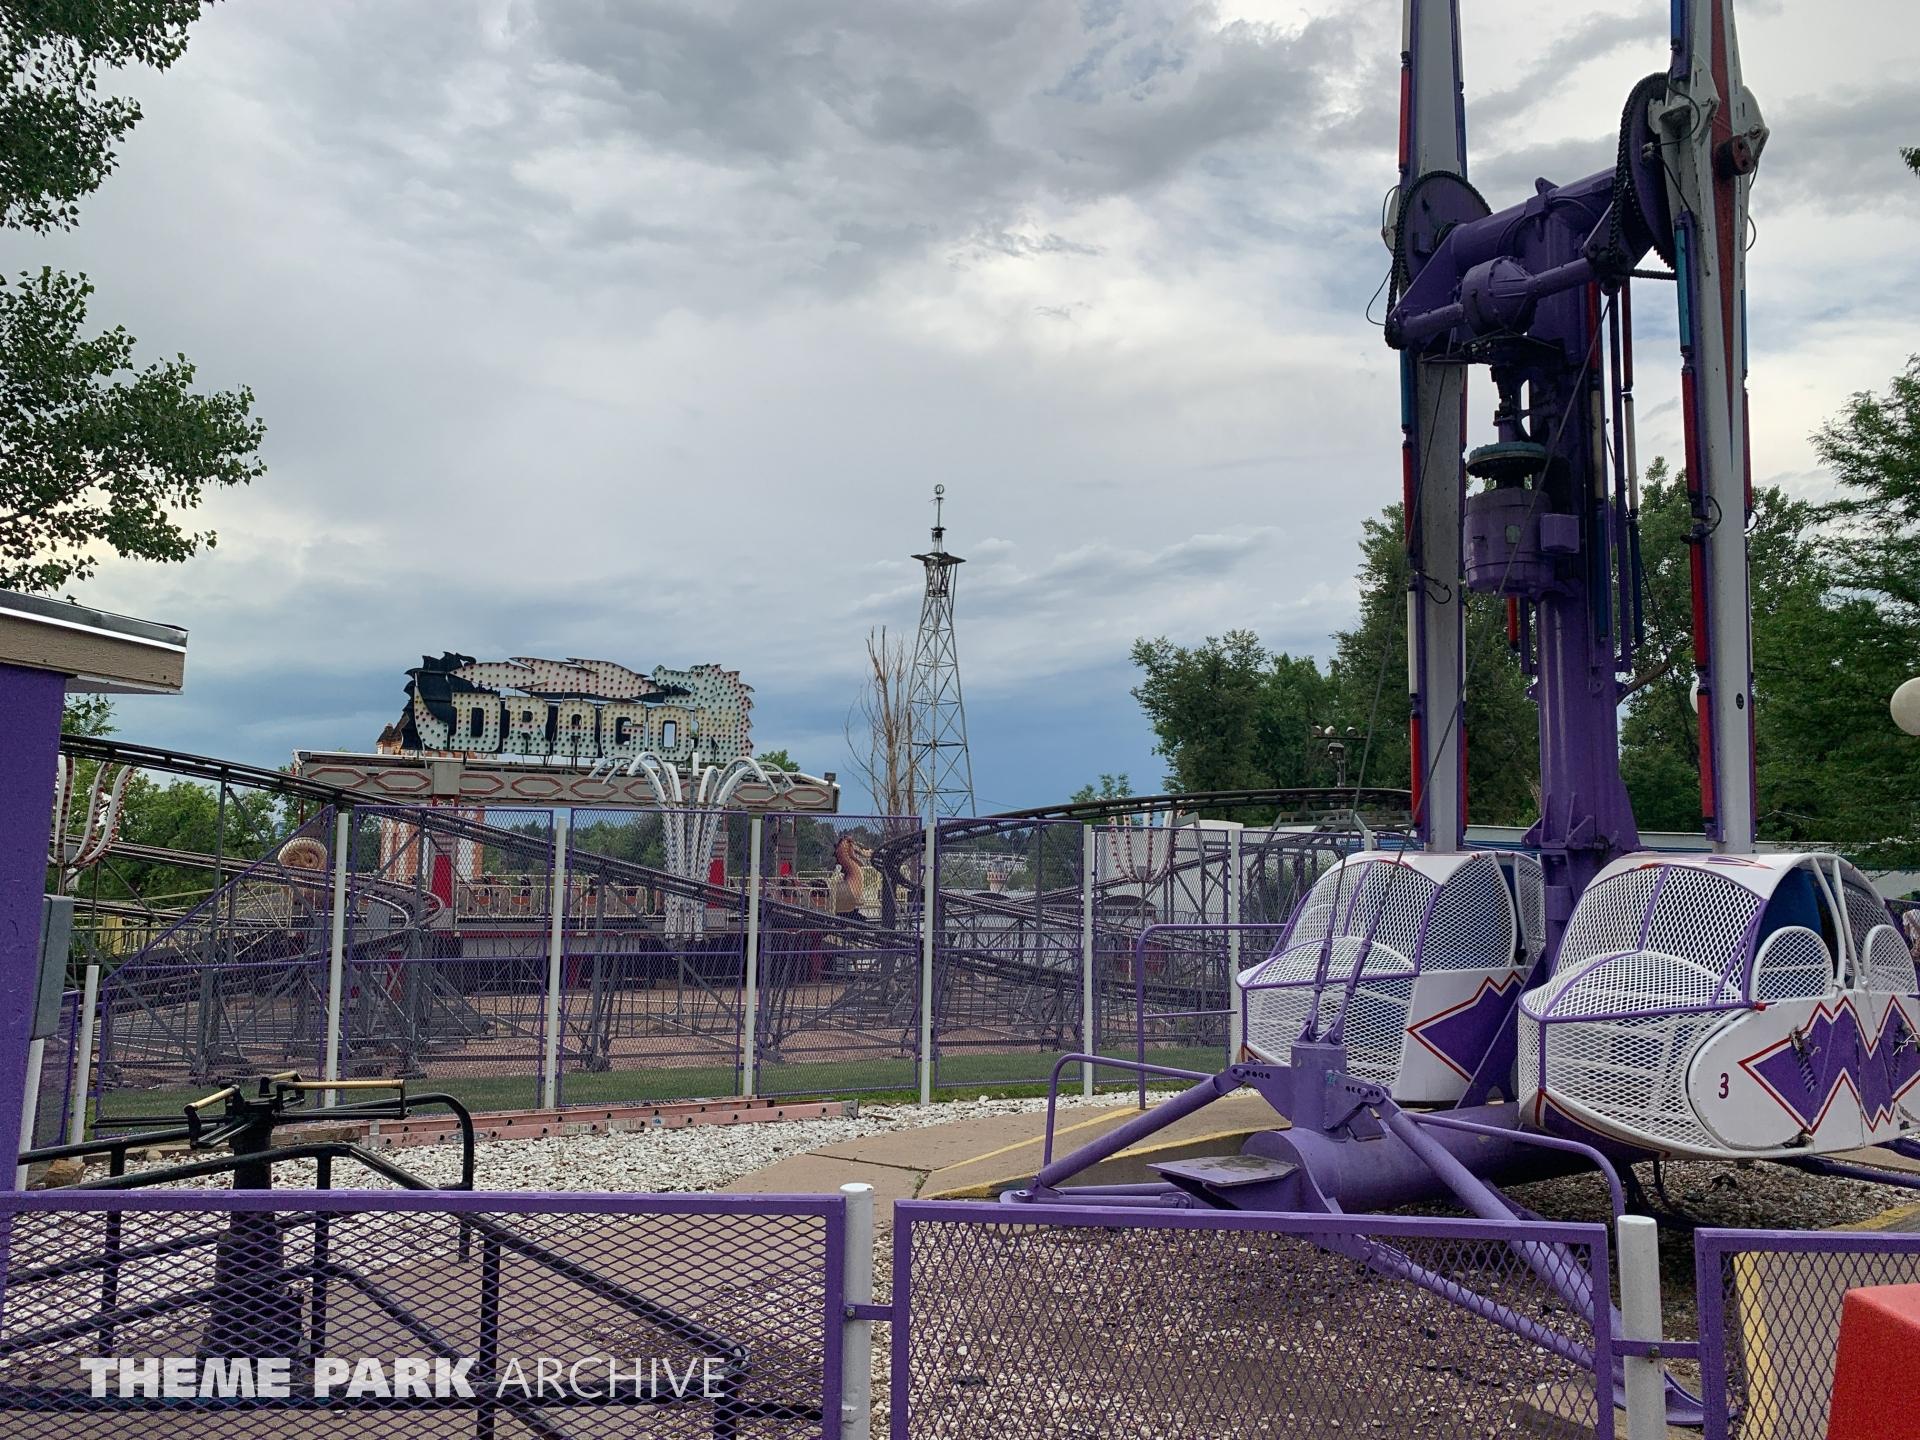 Loop O Plane at Lakeside Amusement Park